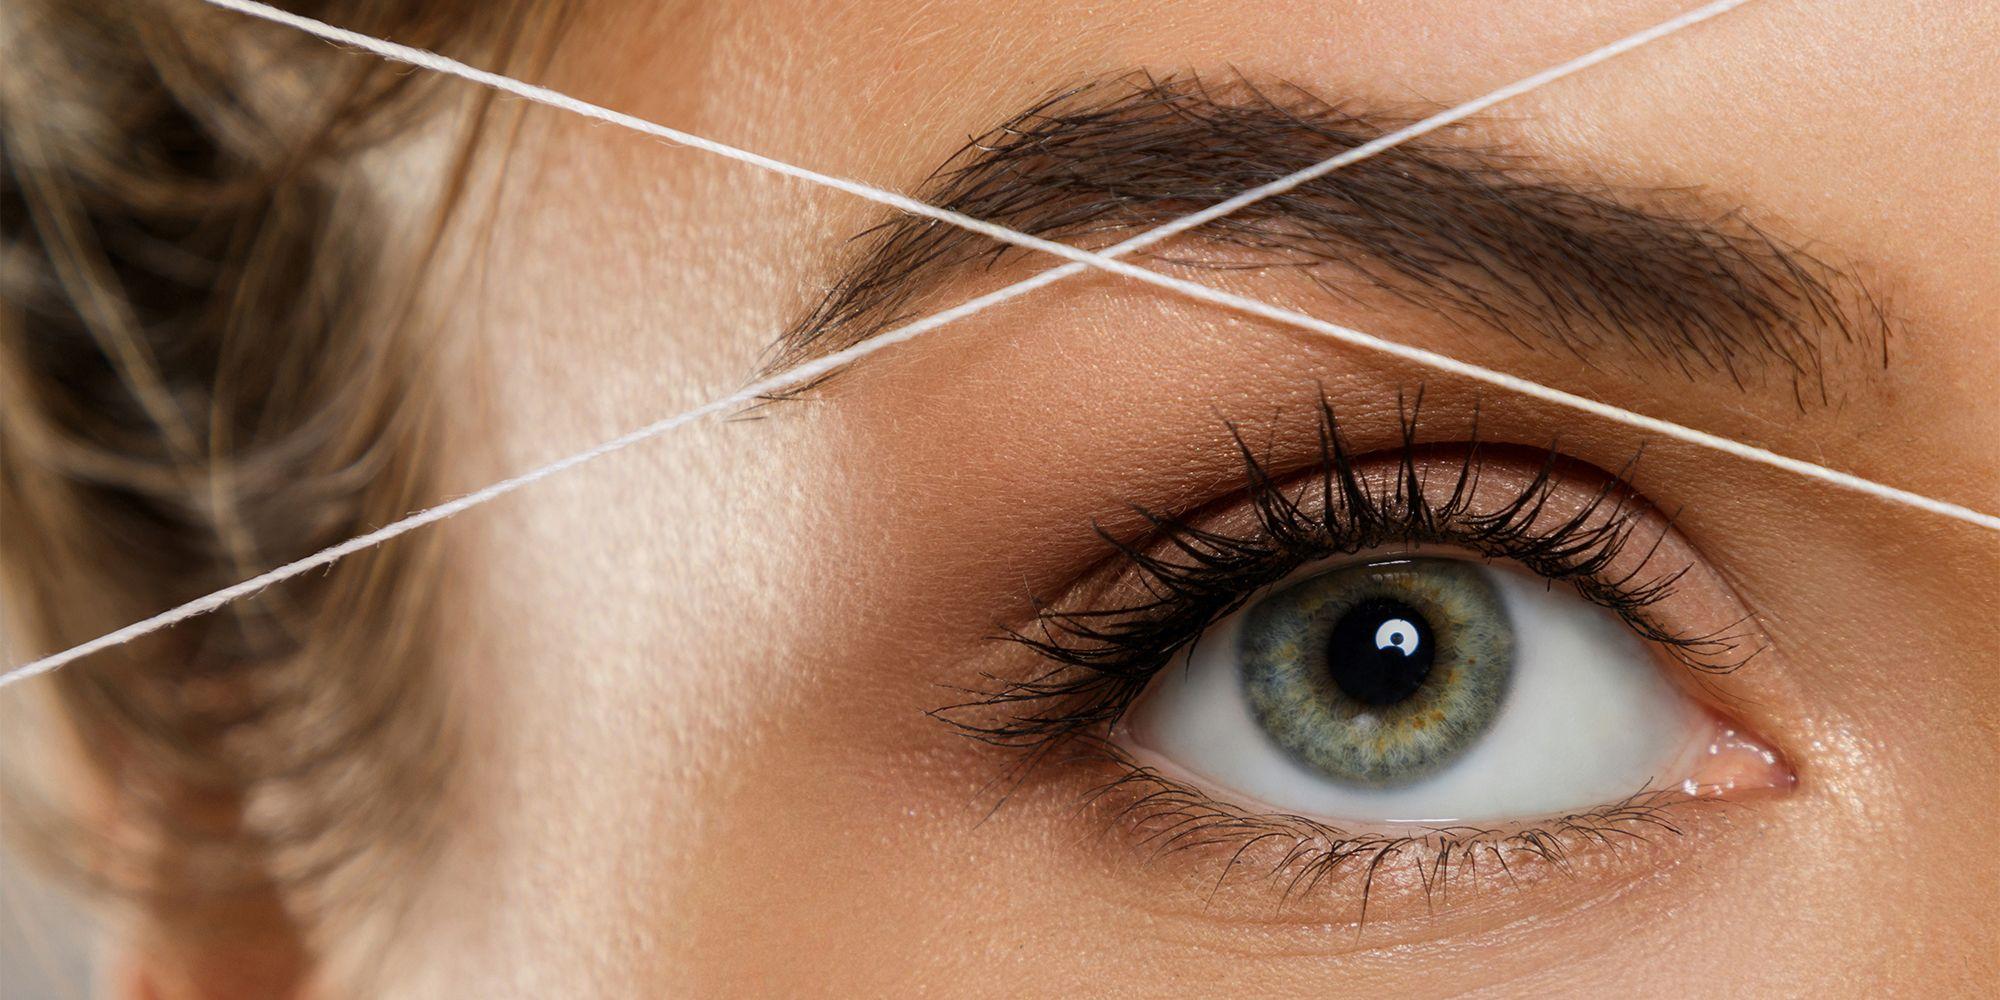 hbz-eyebrow-threading-index-gettyimages-1083288172